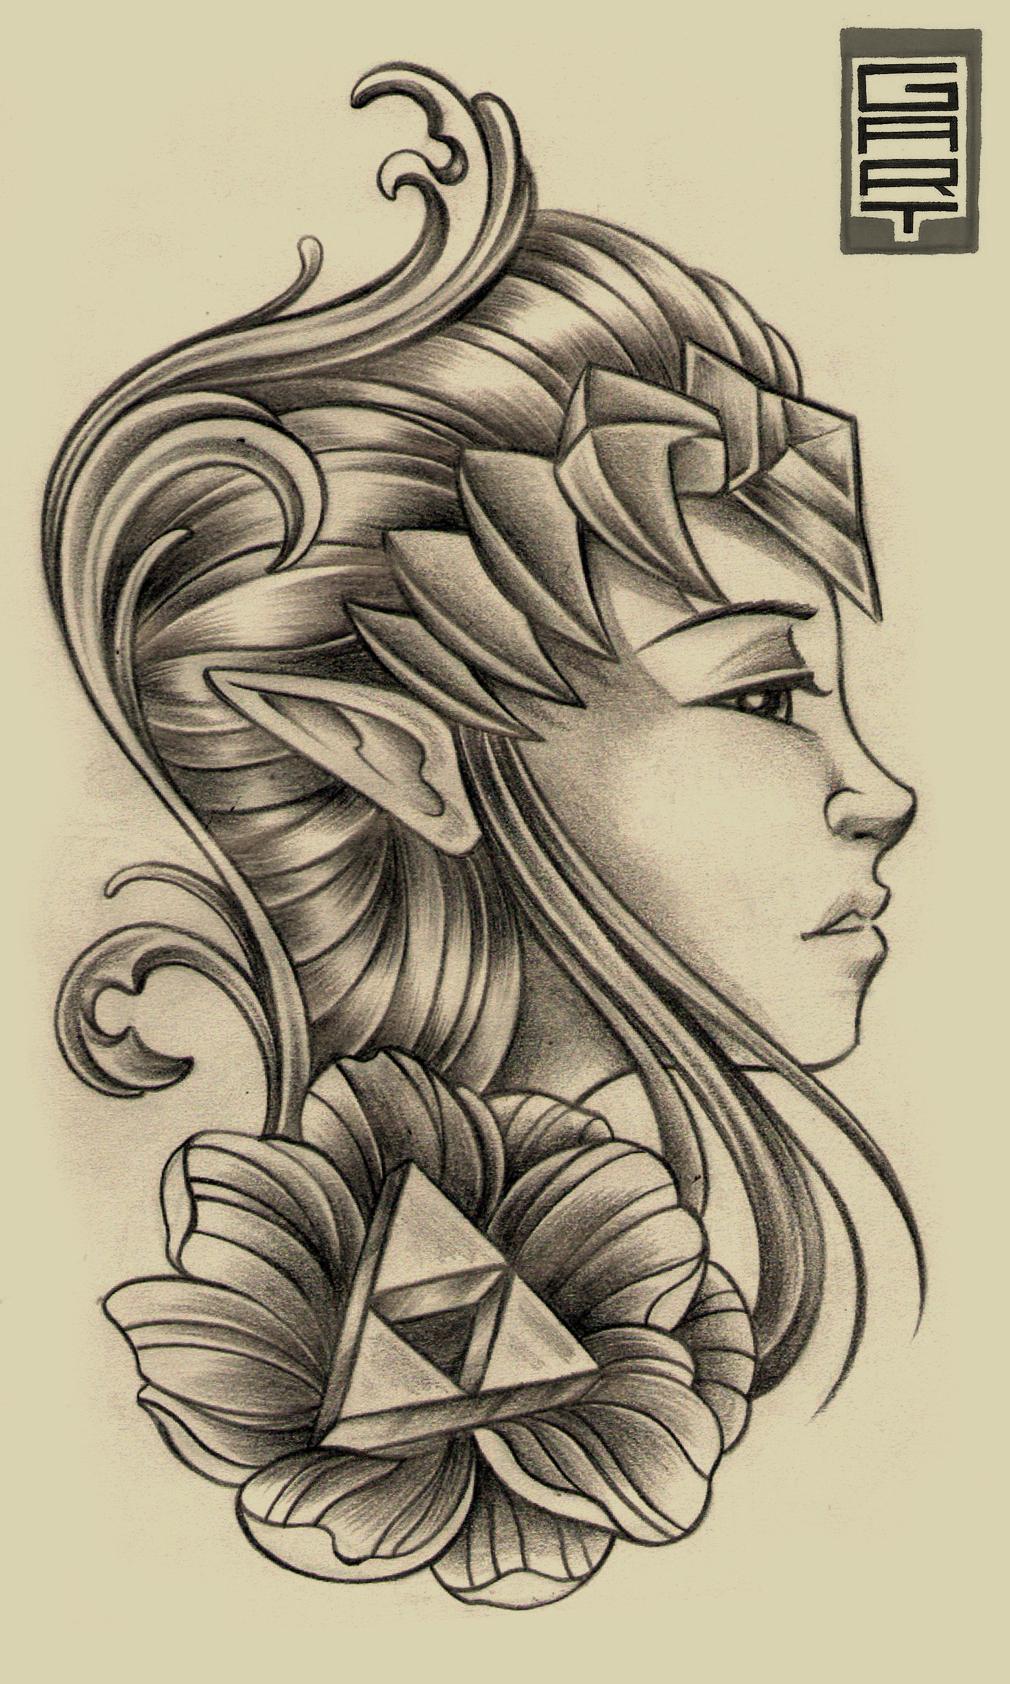 Zelda Neotradicional by AbrahamGart